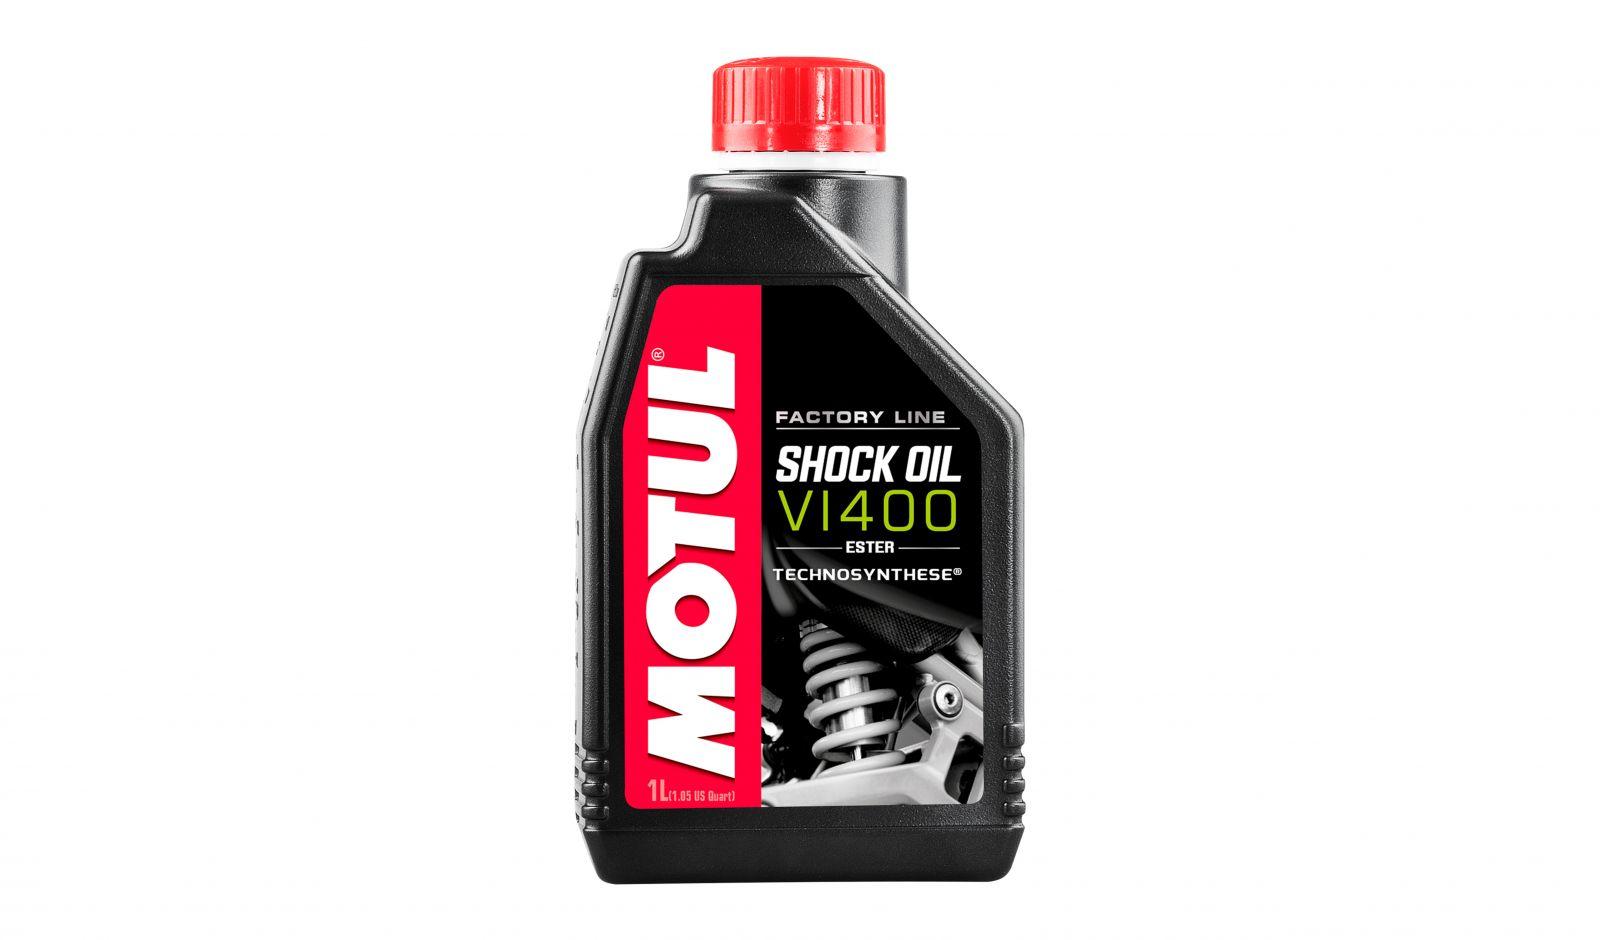 shock oils - 670771M image